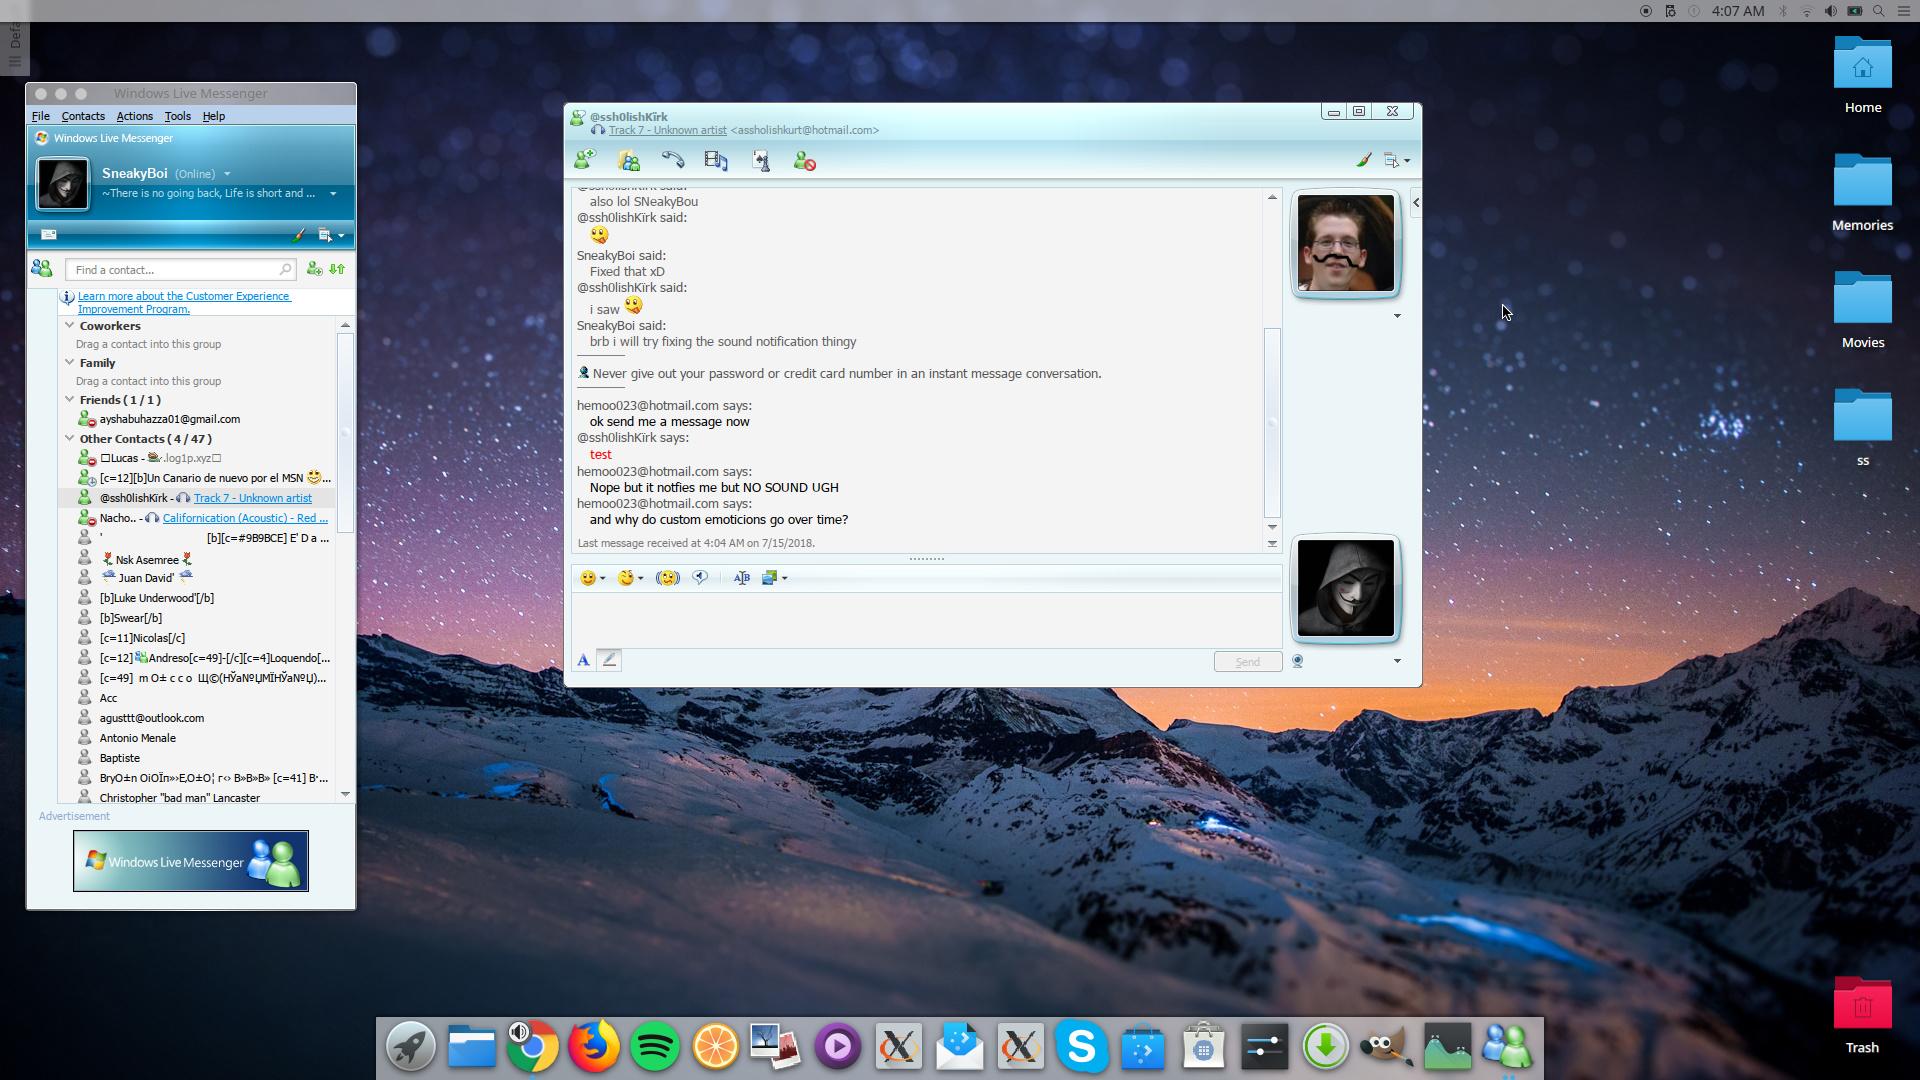 Got windows live messenger 8 5 working on Linux - Messenger